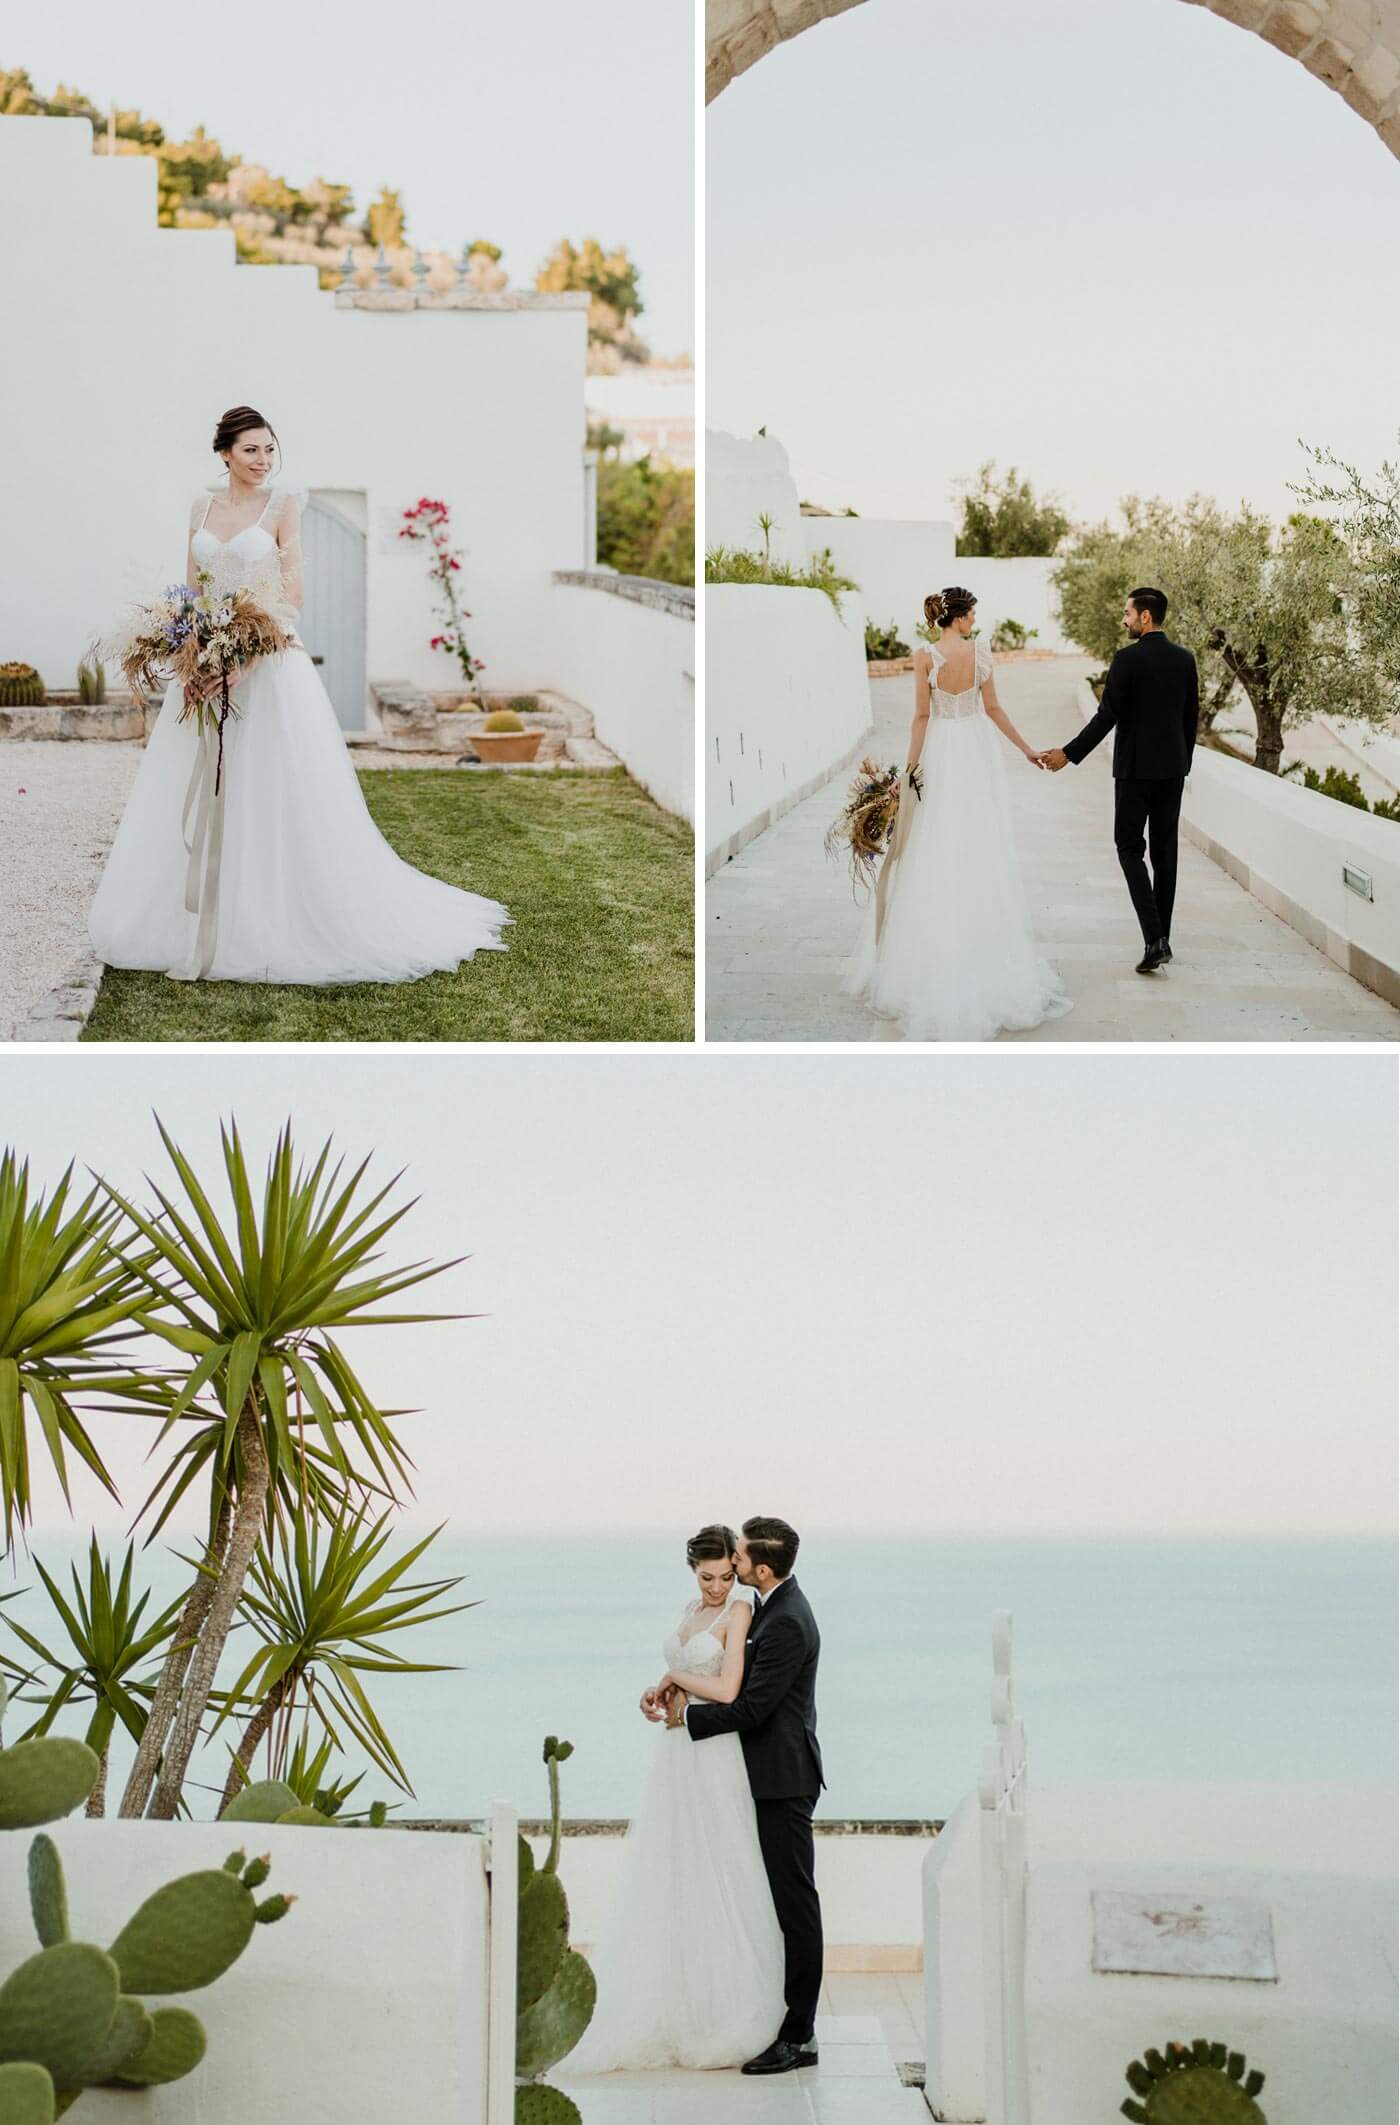 Heiraten am Strand Italien